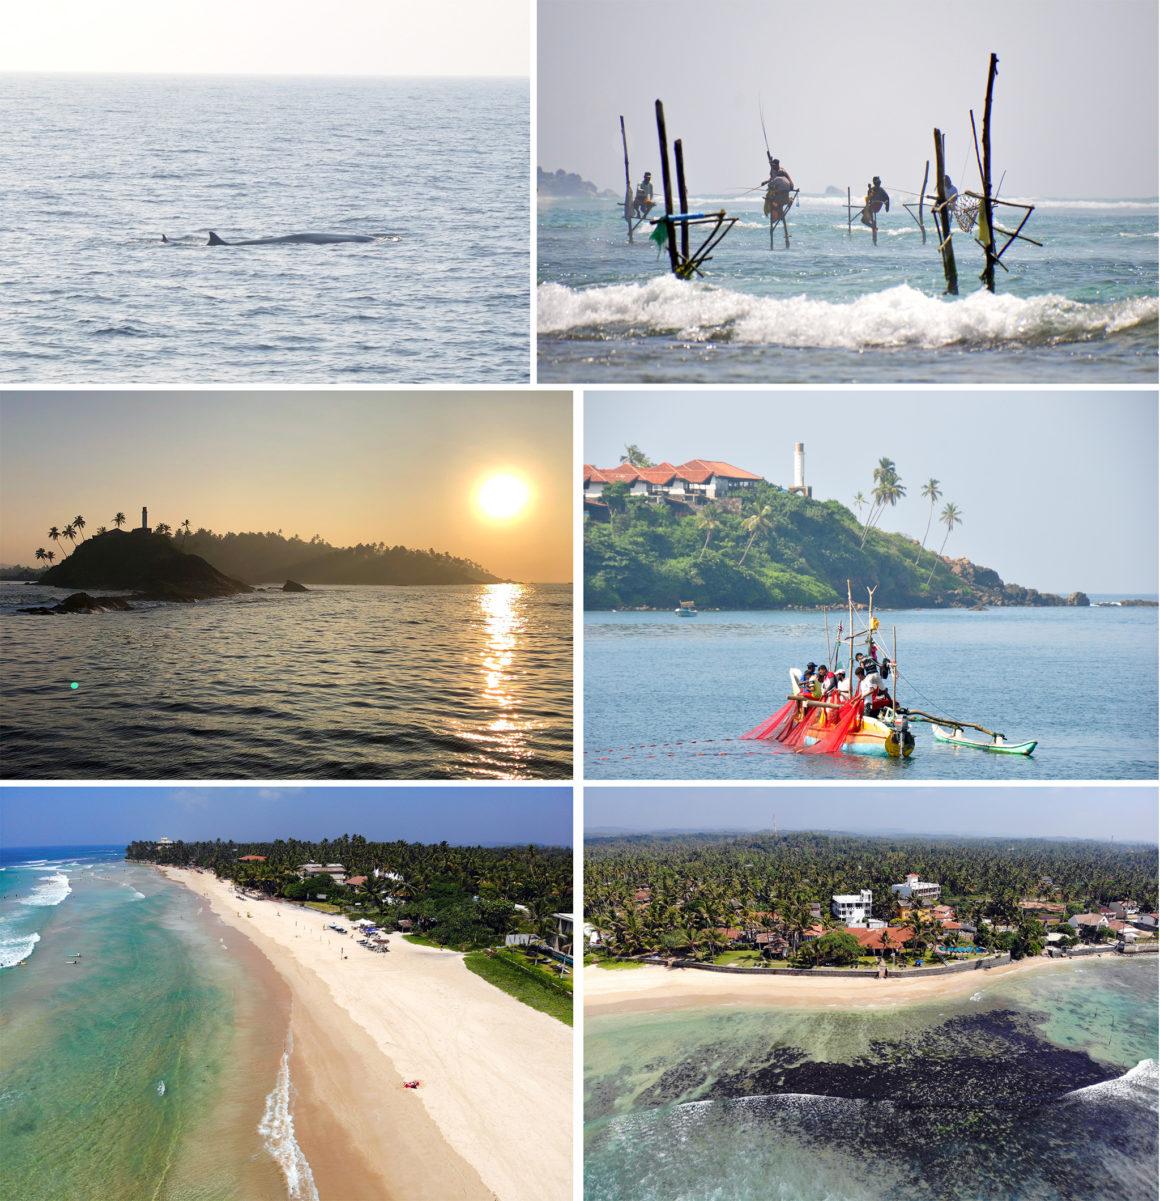 ruta por Sri Lanka en 8 días ruta por sri lanka en 8 días - thewotme unawatuna mirissa whales galle mosvold villa 1160x1201 - Nuestra ruta por Sri Lanka en 8 días, diario de viaje